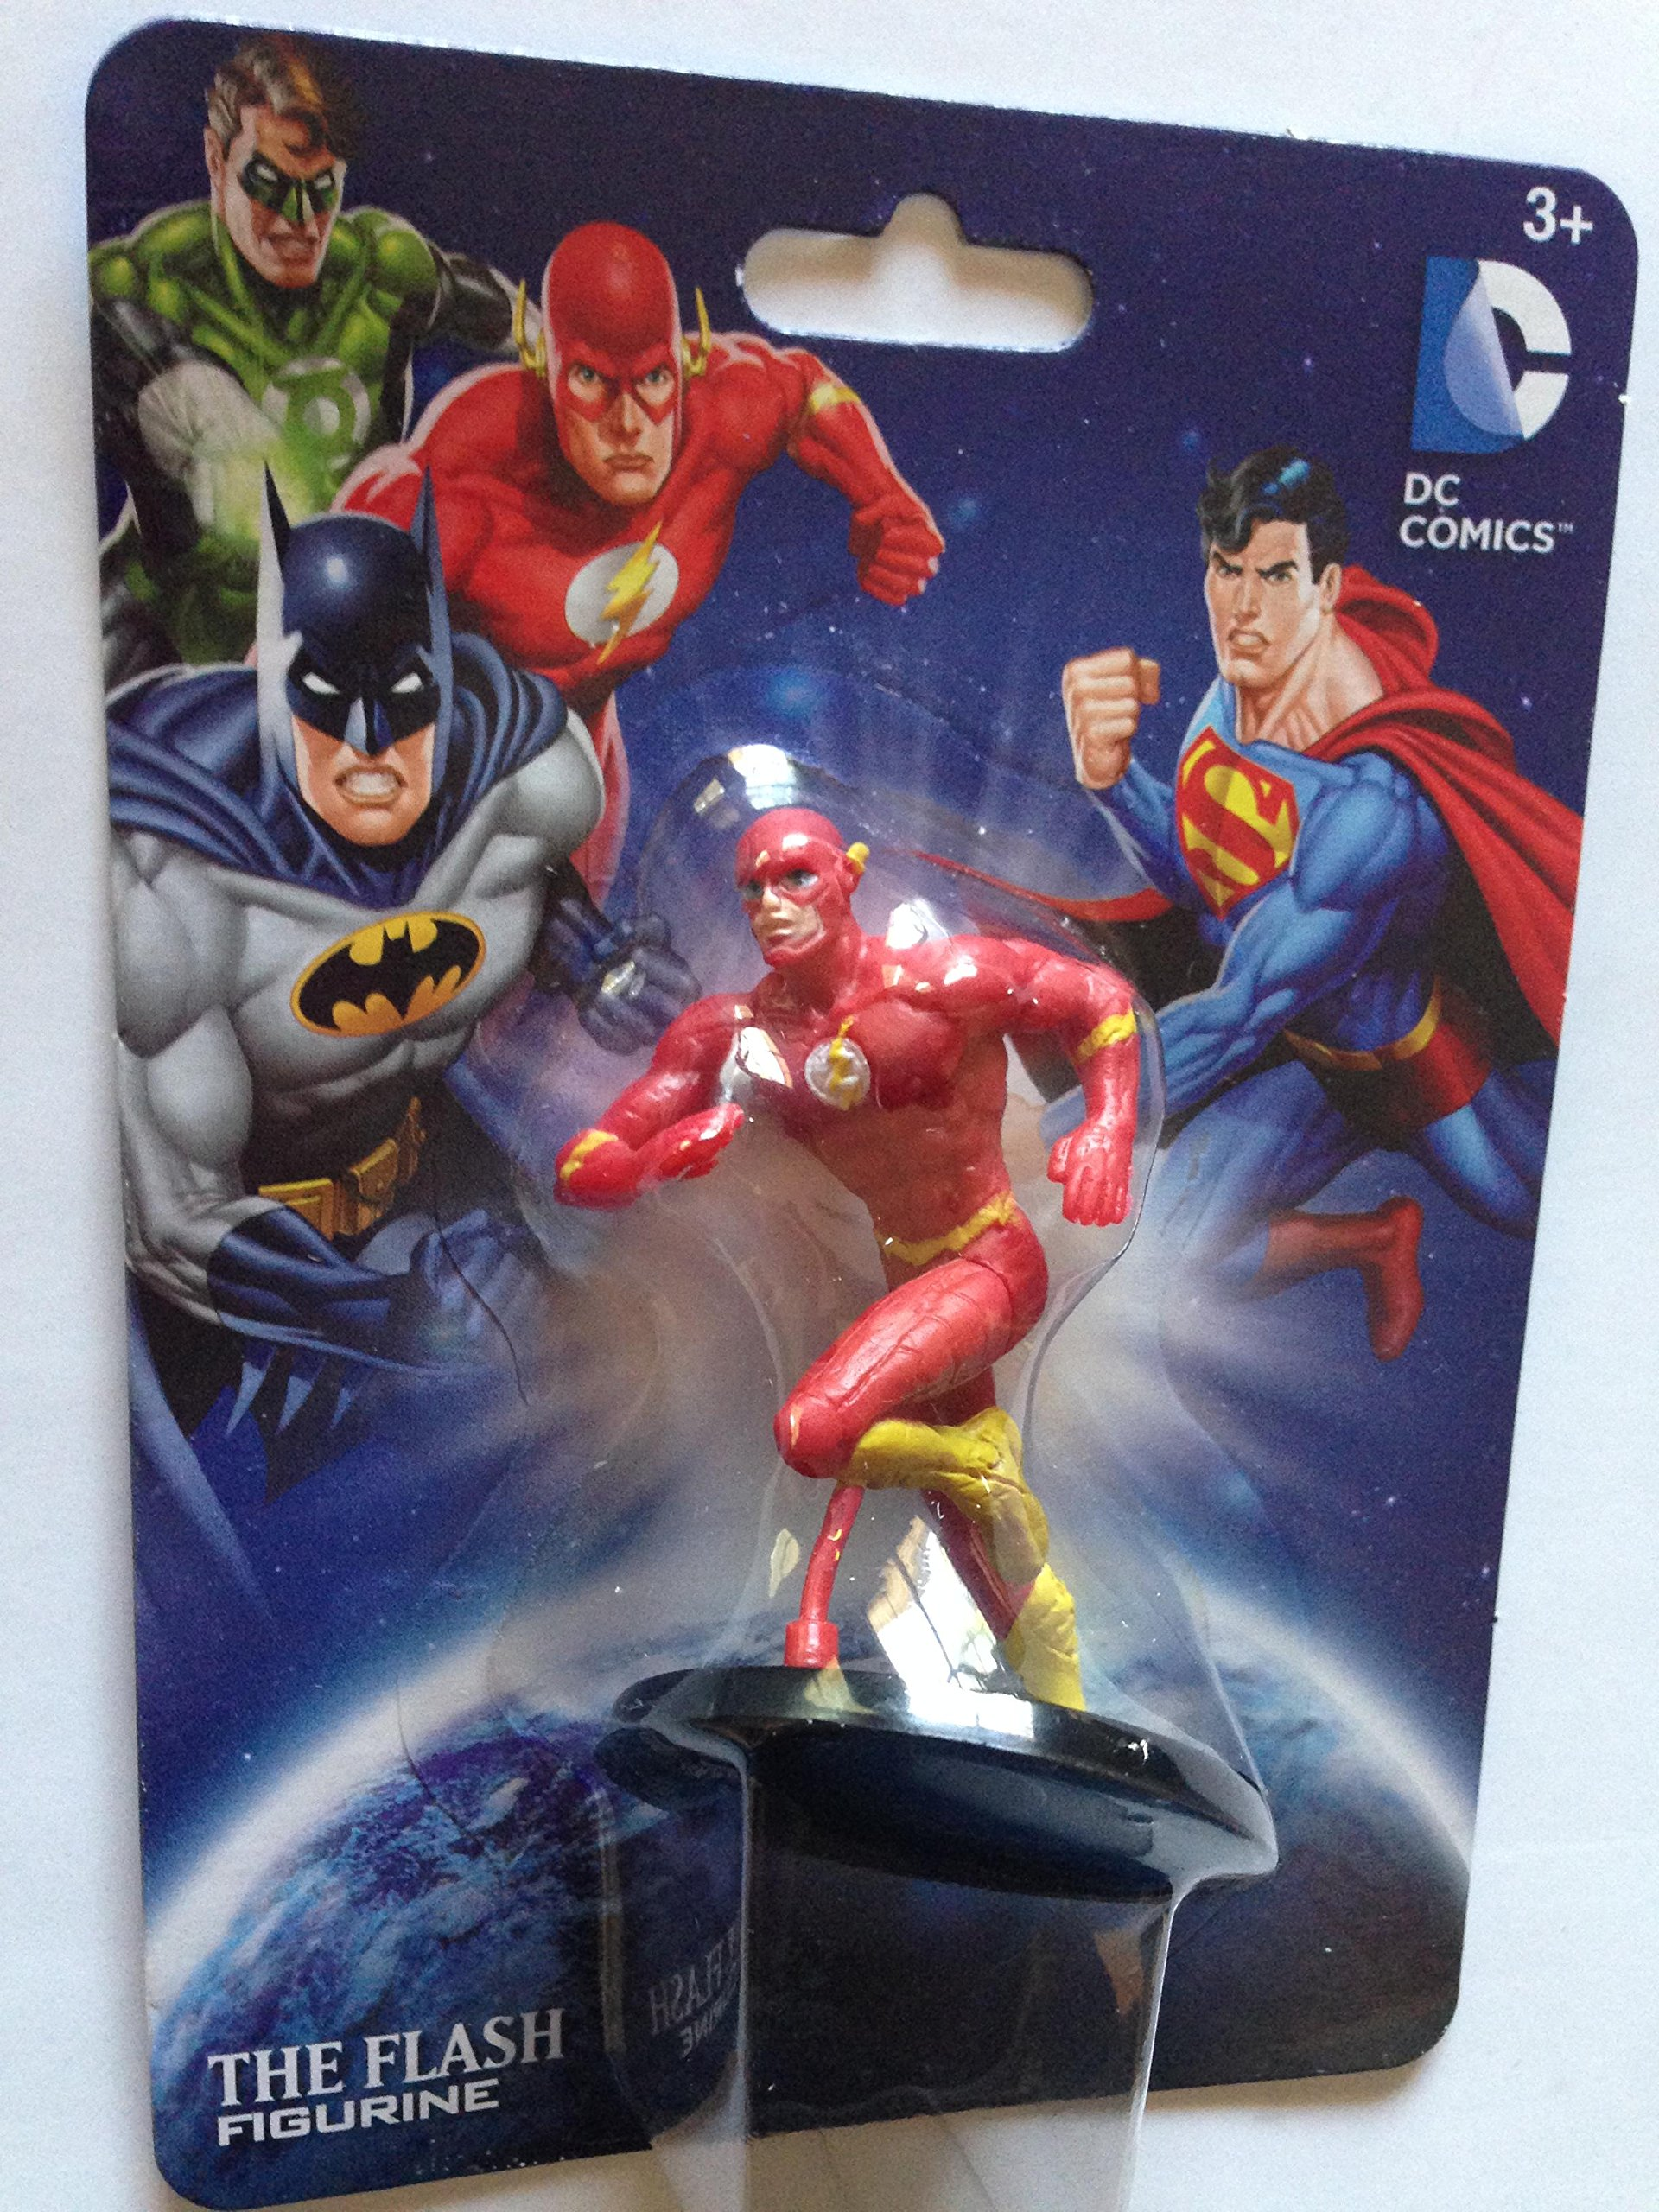 The Flash Figurine Cake Topper